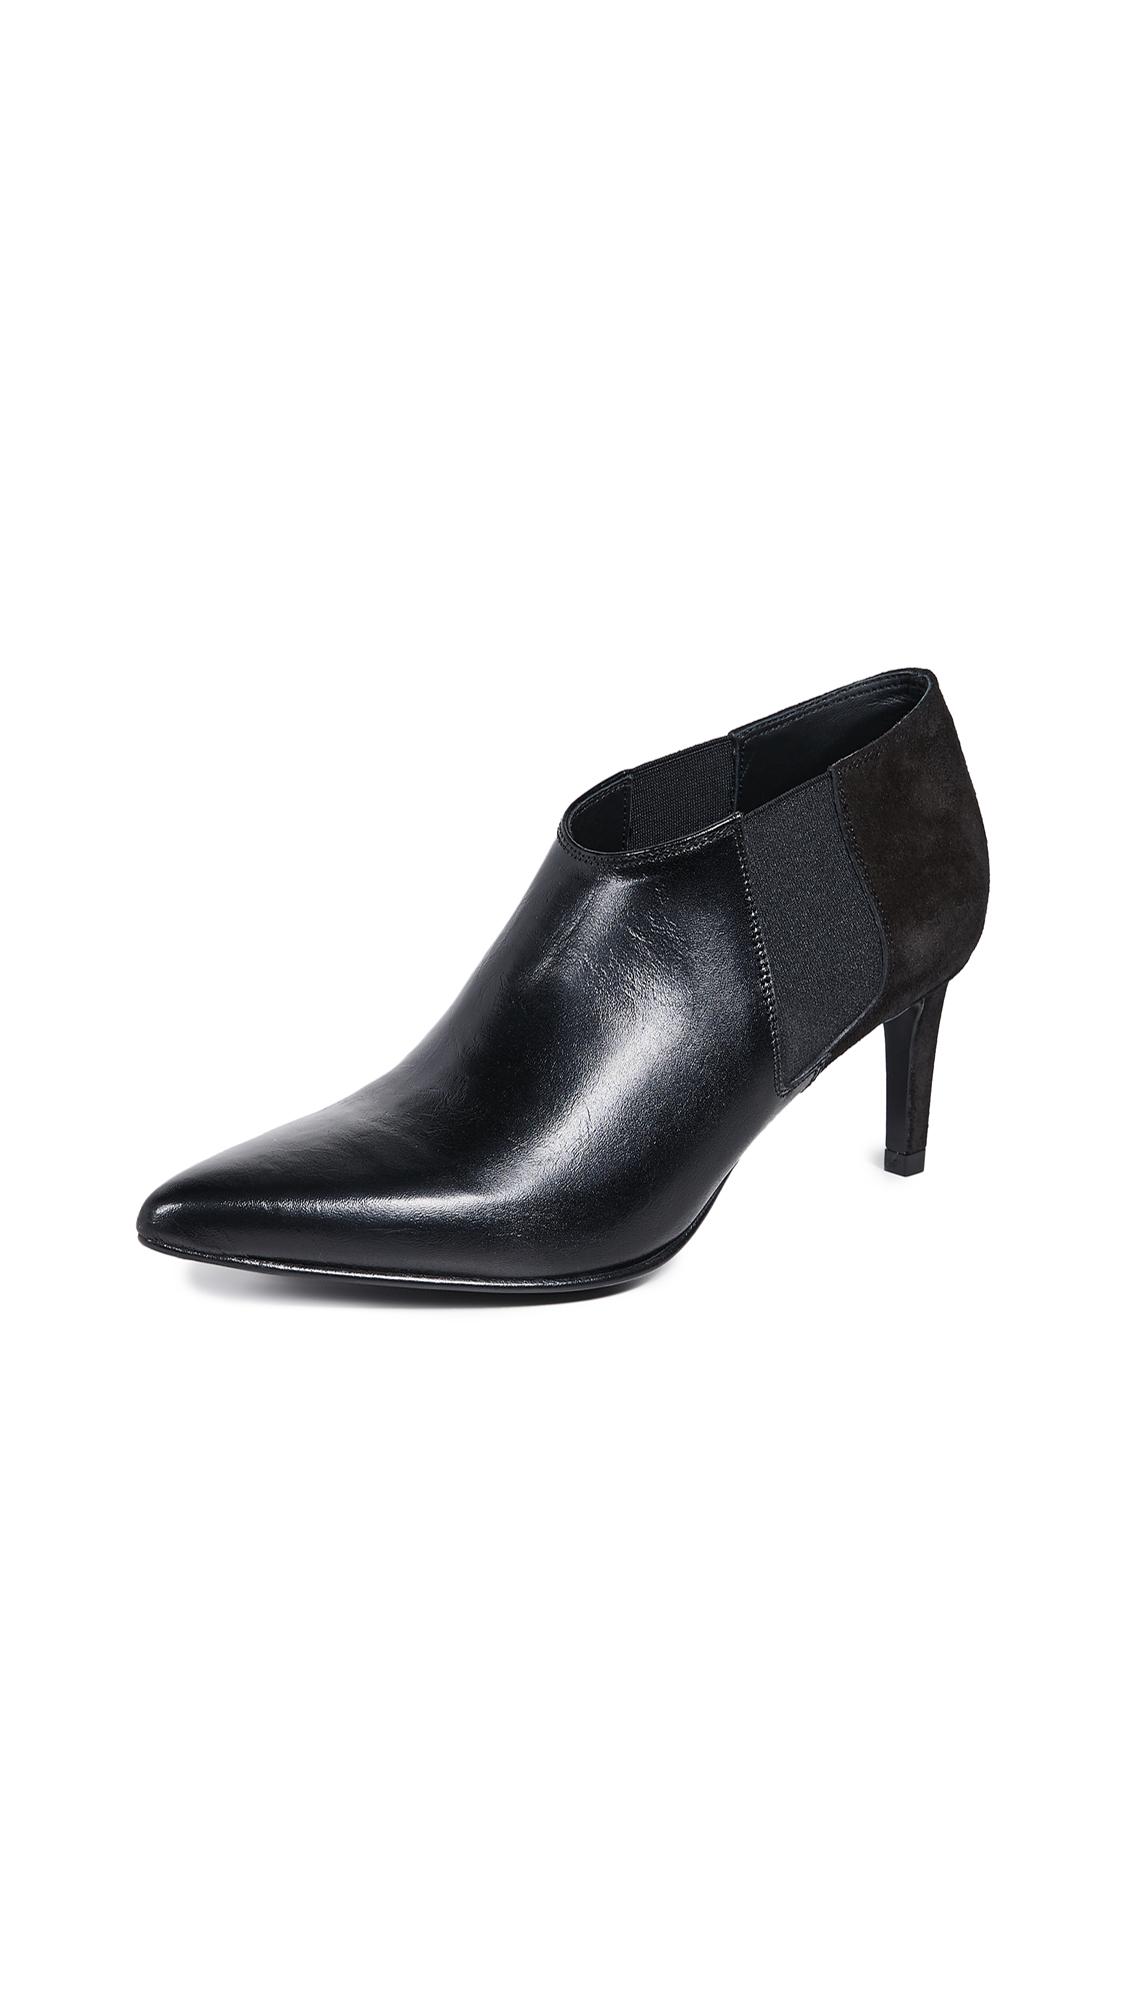 Rag & Bone Beha Chelsea Shootie Boots - Black